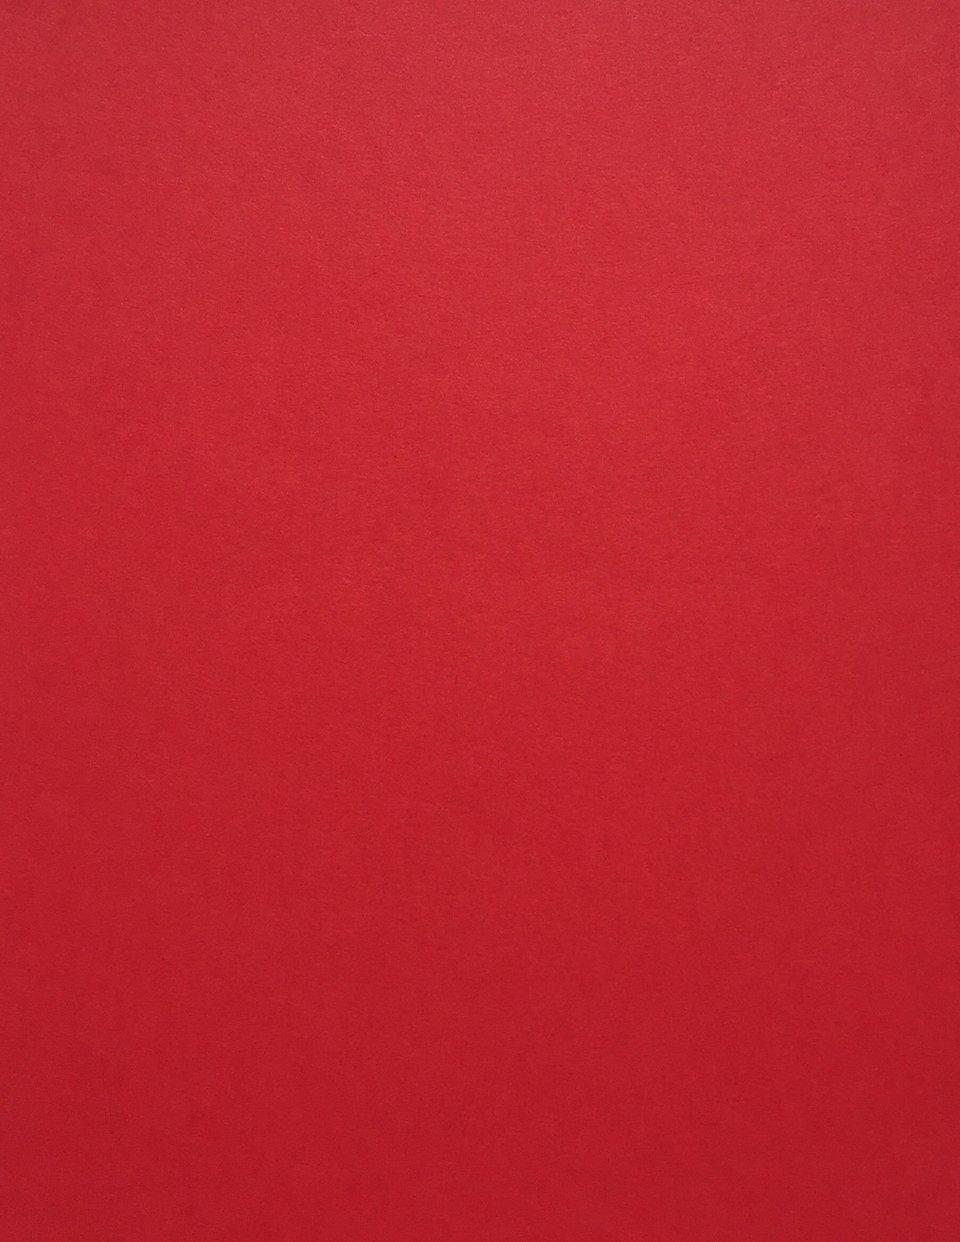 50 Sheets from Cardstock Warehouse Premium Cover Pink Lemonade Cardstock Paper 8.5 x 11 inch 65 lb